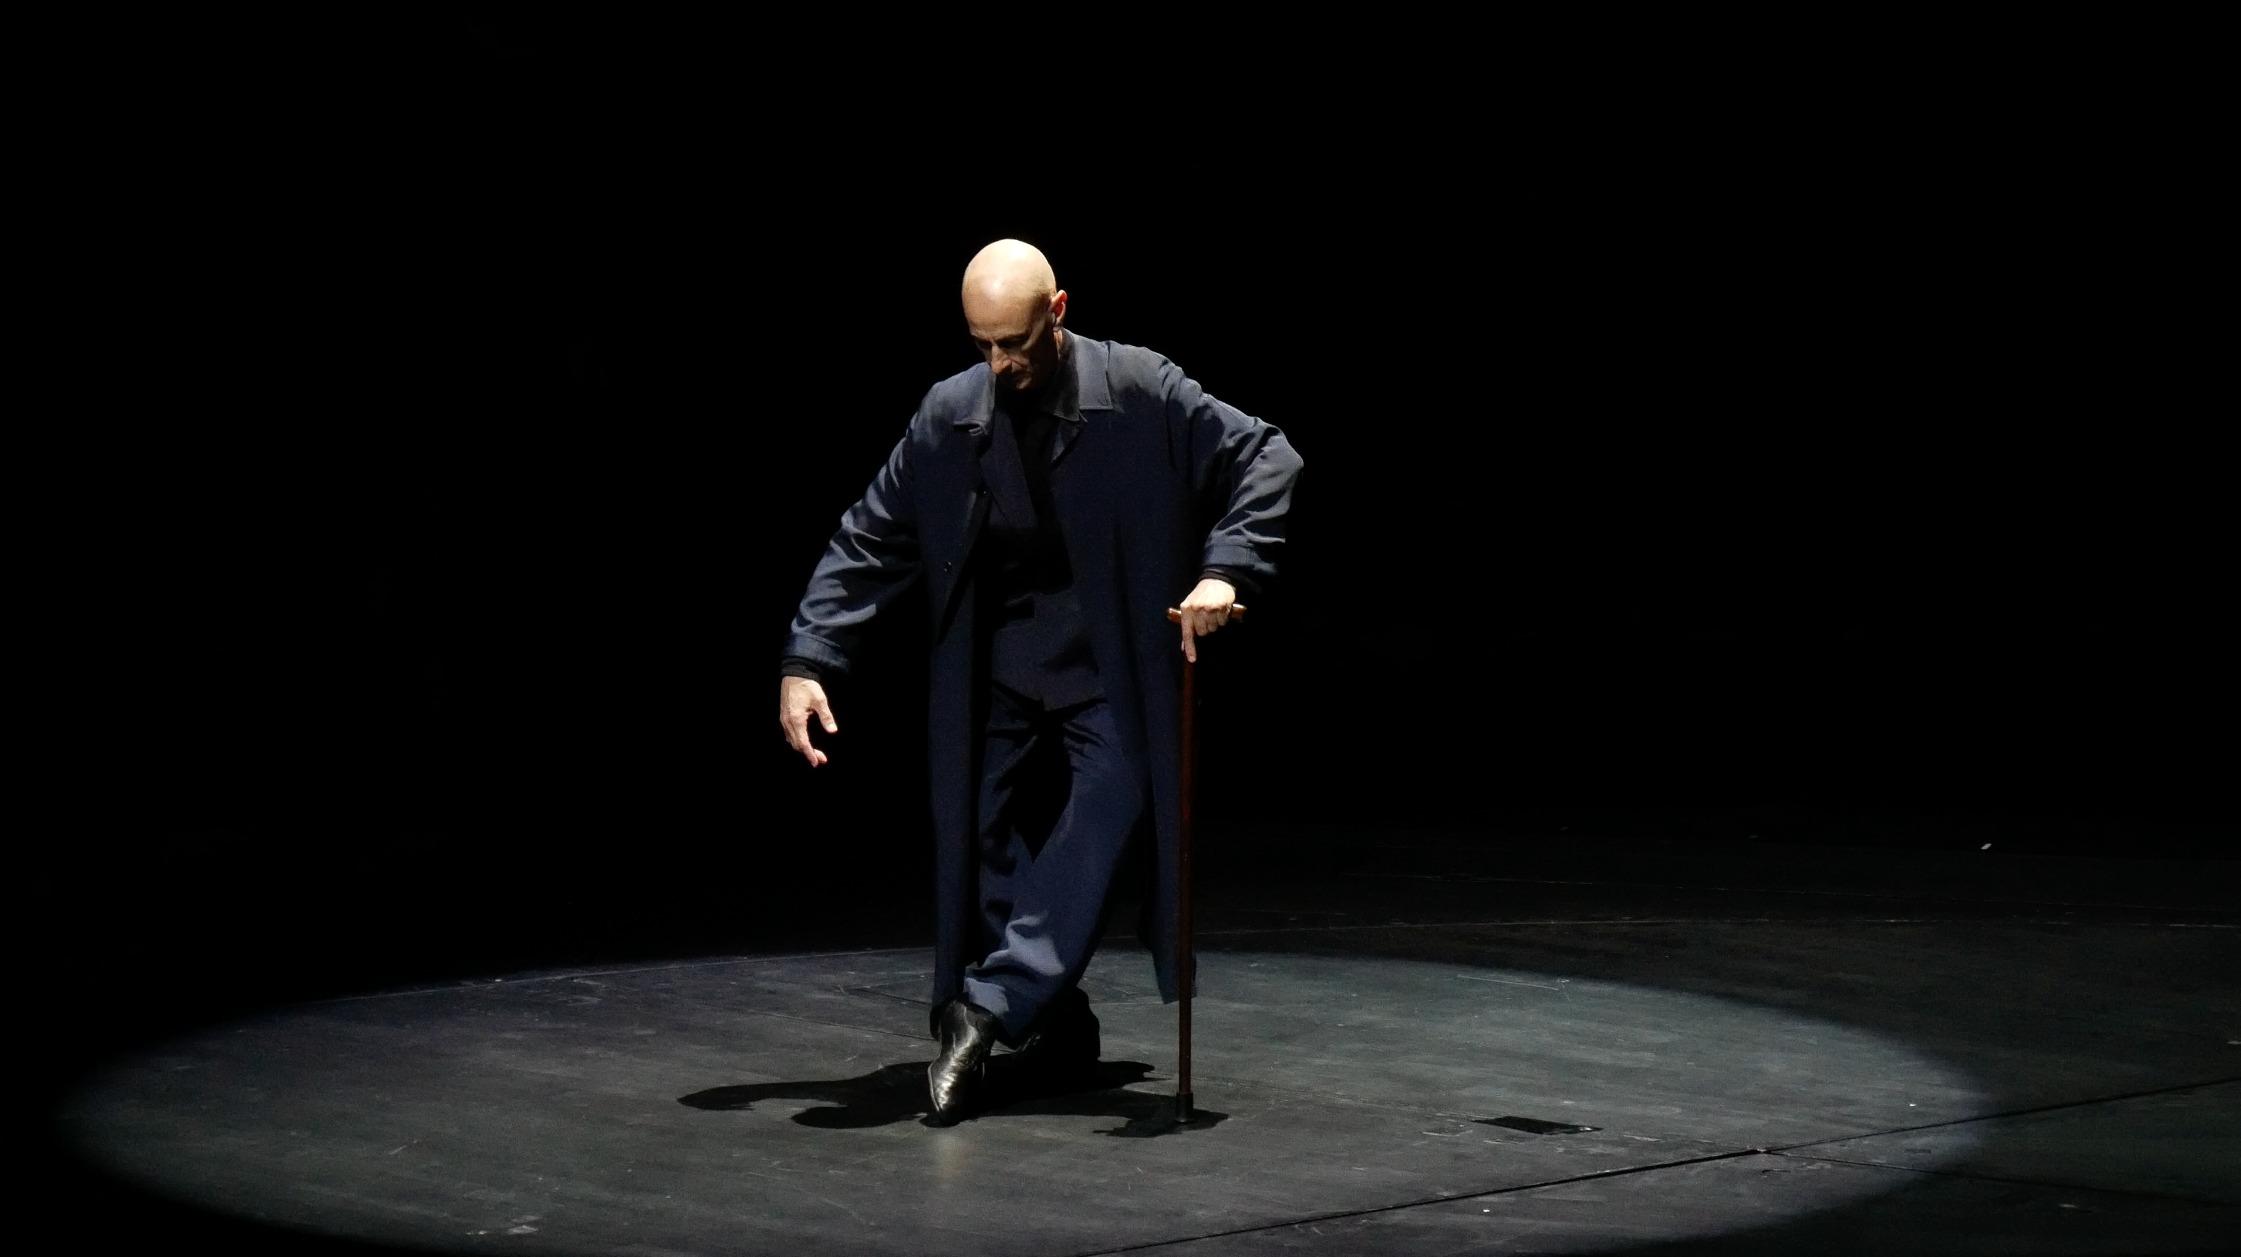 ©PRESSEBILDER Klaus Dilger_TANZWEB Verleihung Deutscher Tanzpreis 2018 in Essen Cesc Gelabert_Im Goldenen Schnitt